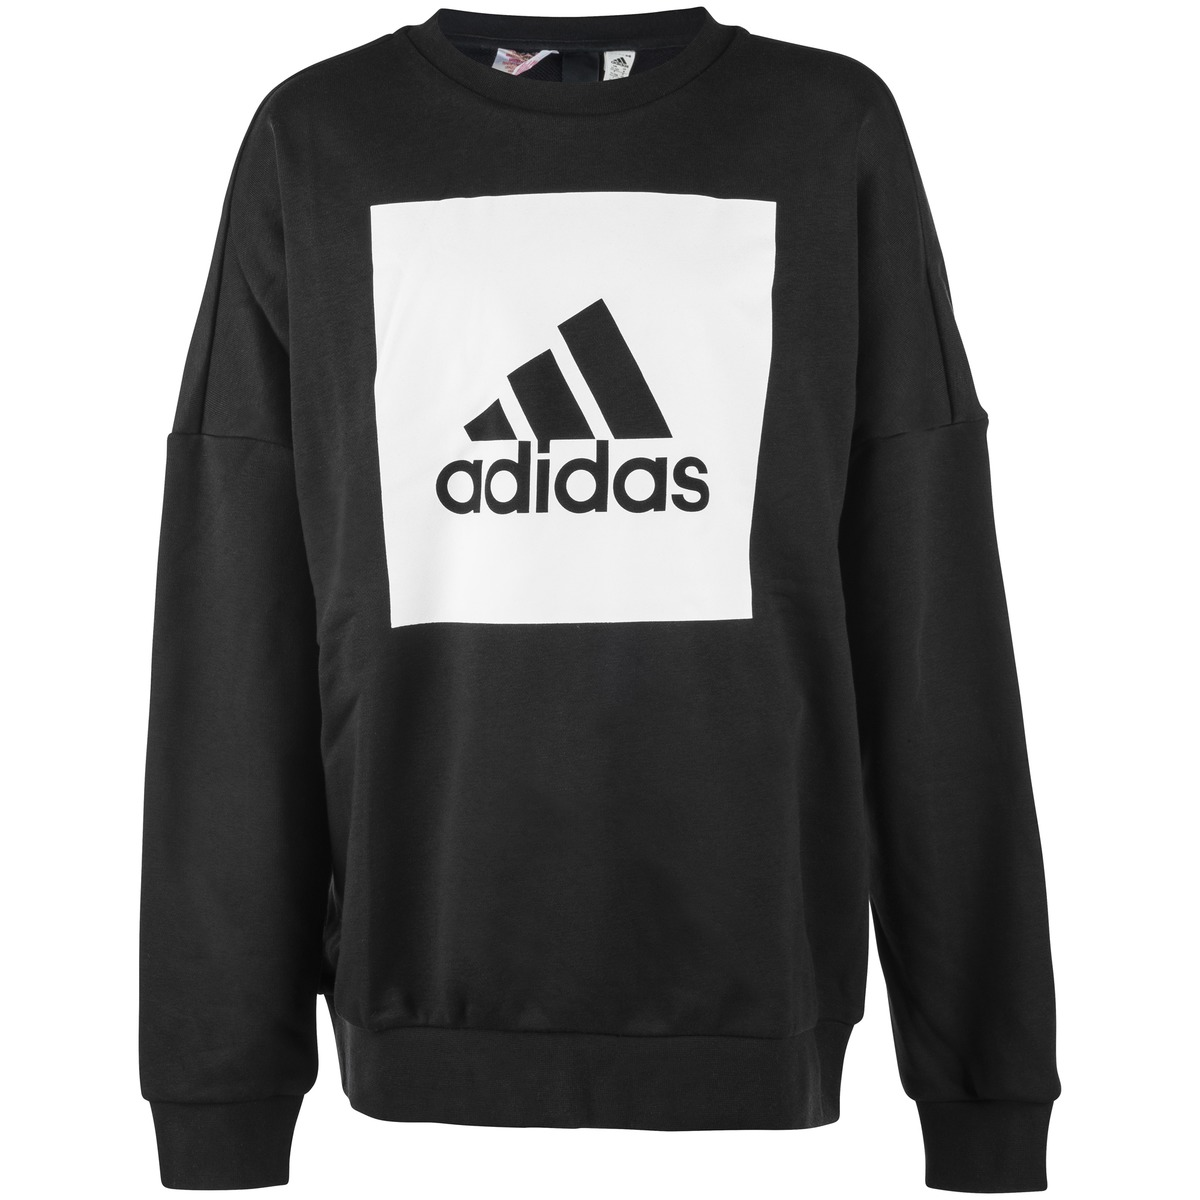 adidas xxl pullover